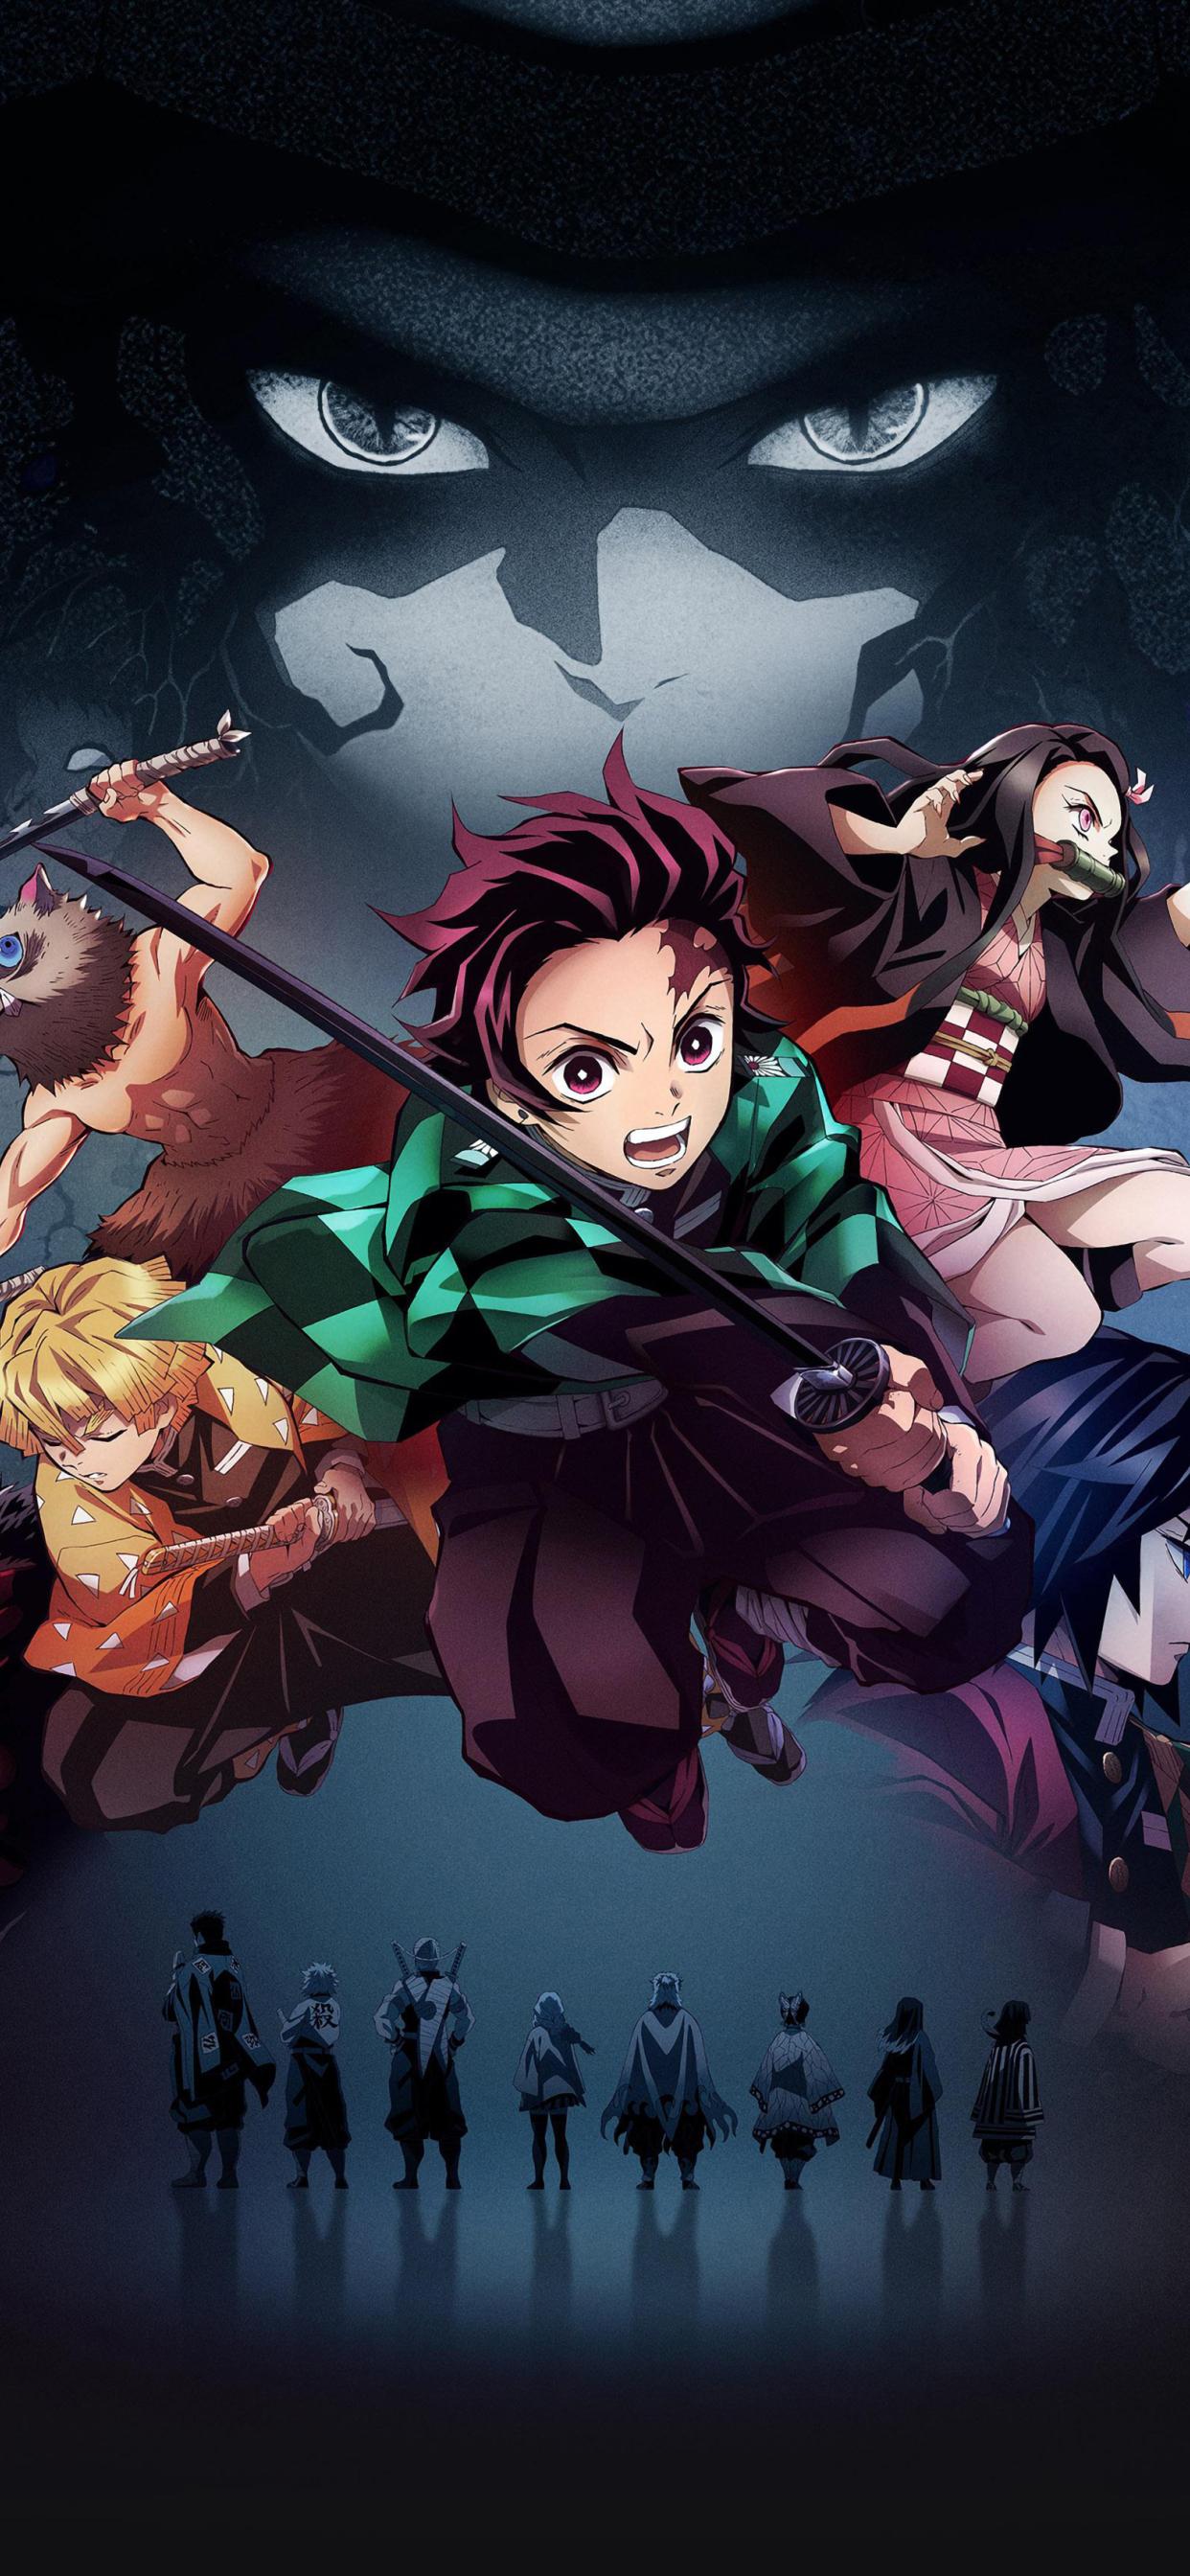 1242x2688 Demon Slayer Iphone XS MAX Wallpaper, HD Anime ...